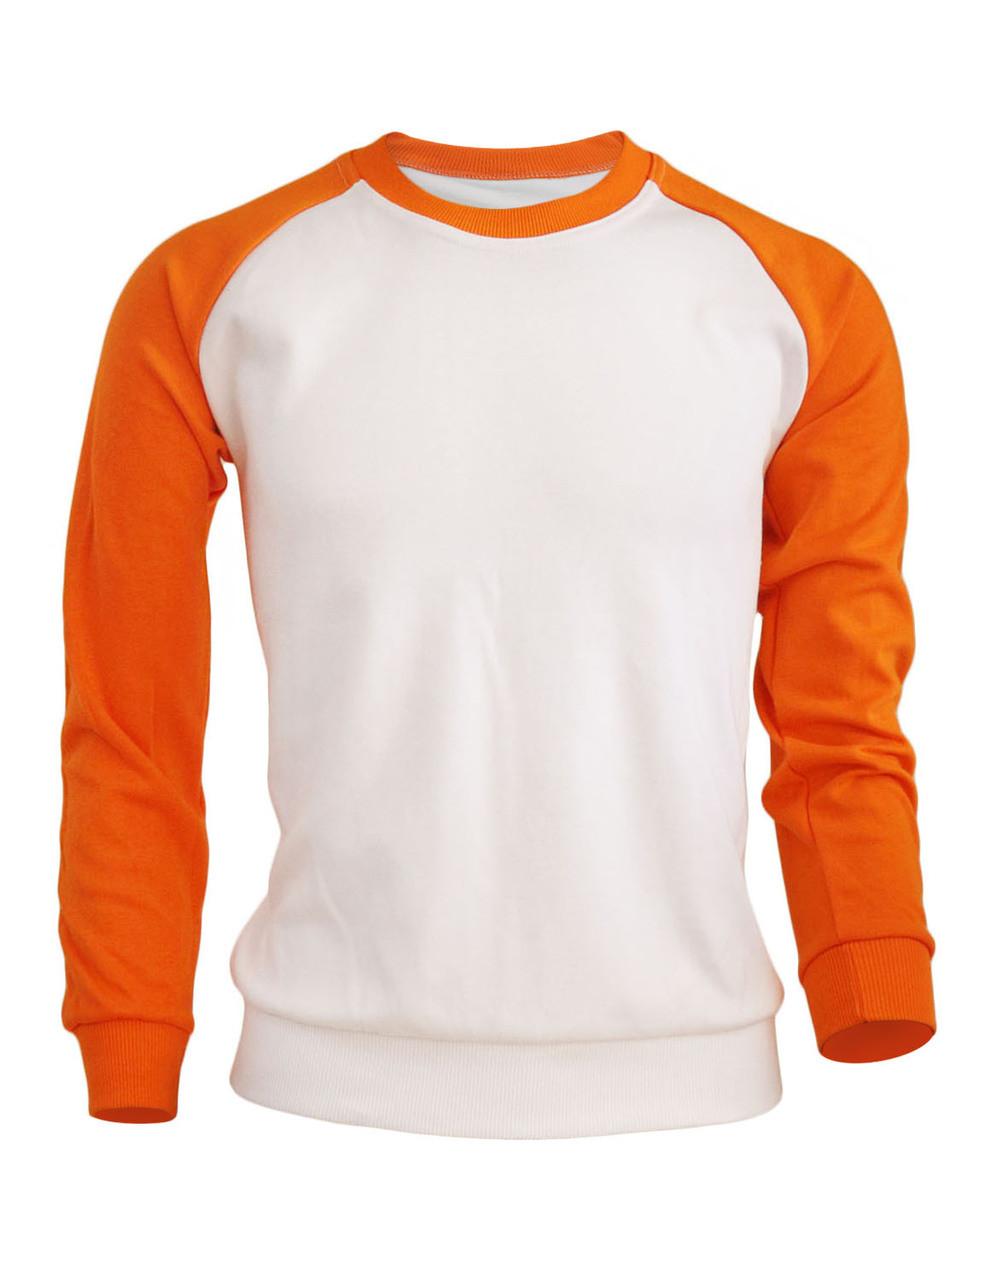 differently c38c2 c3dea BCPOLO Men s Casual raglan 2 tone color t-shirt sportswear fashion crew  neck cotton shirt.-orange ...